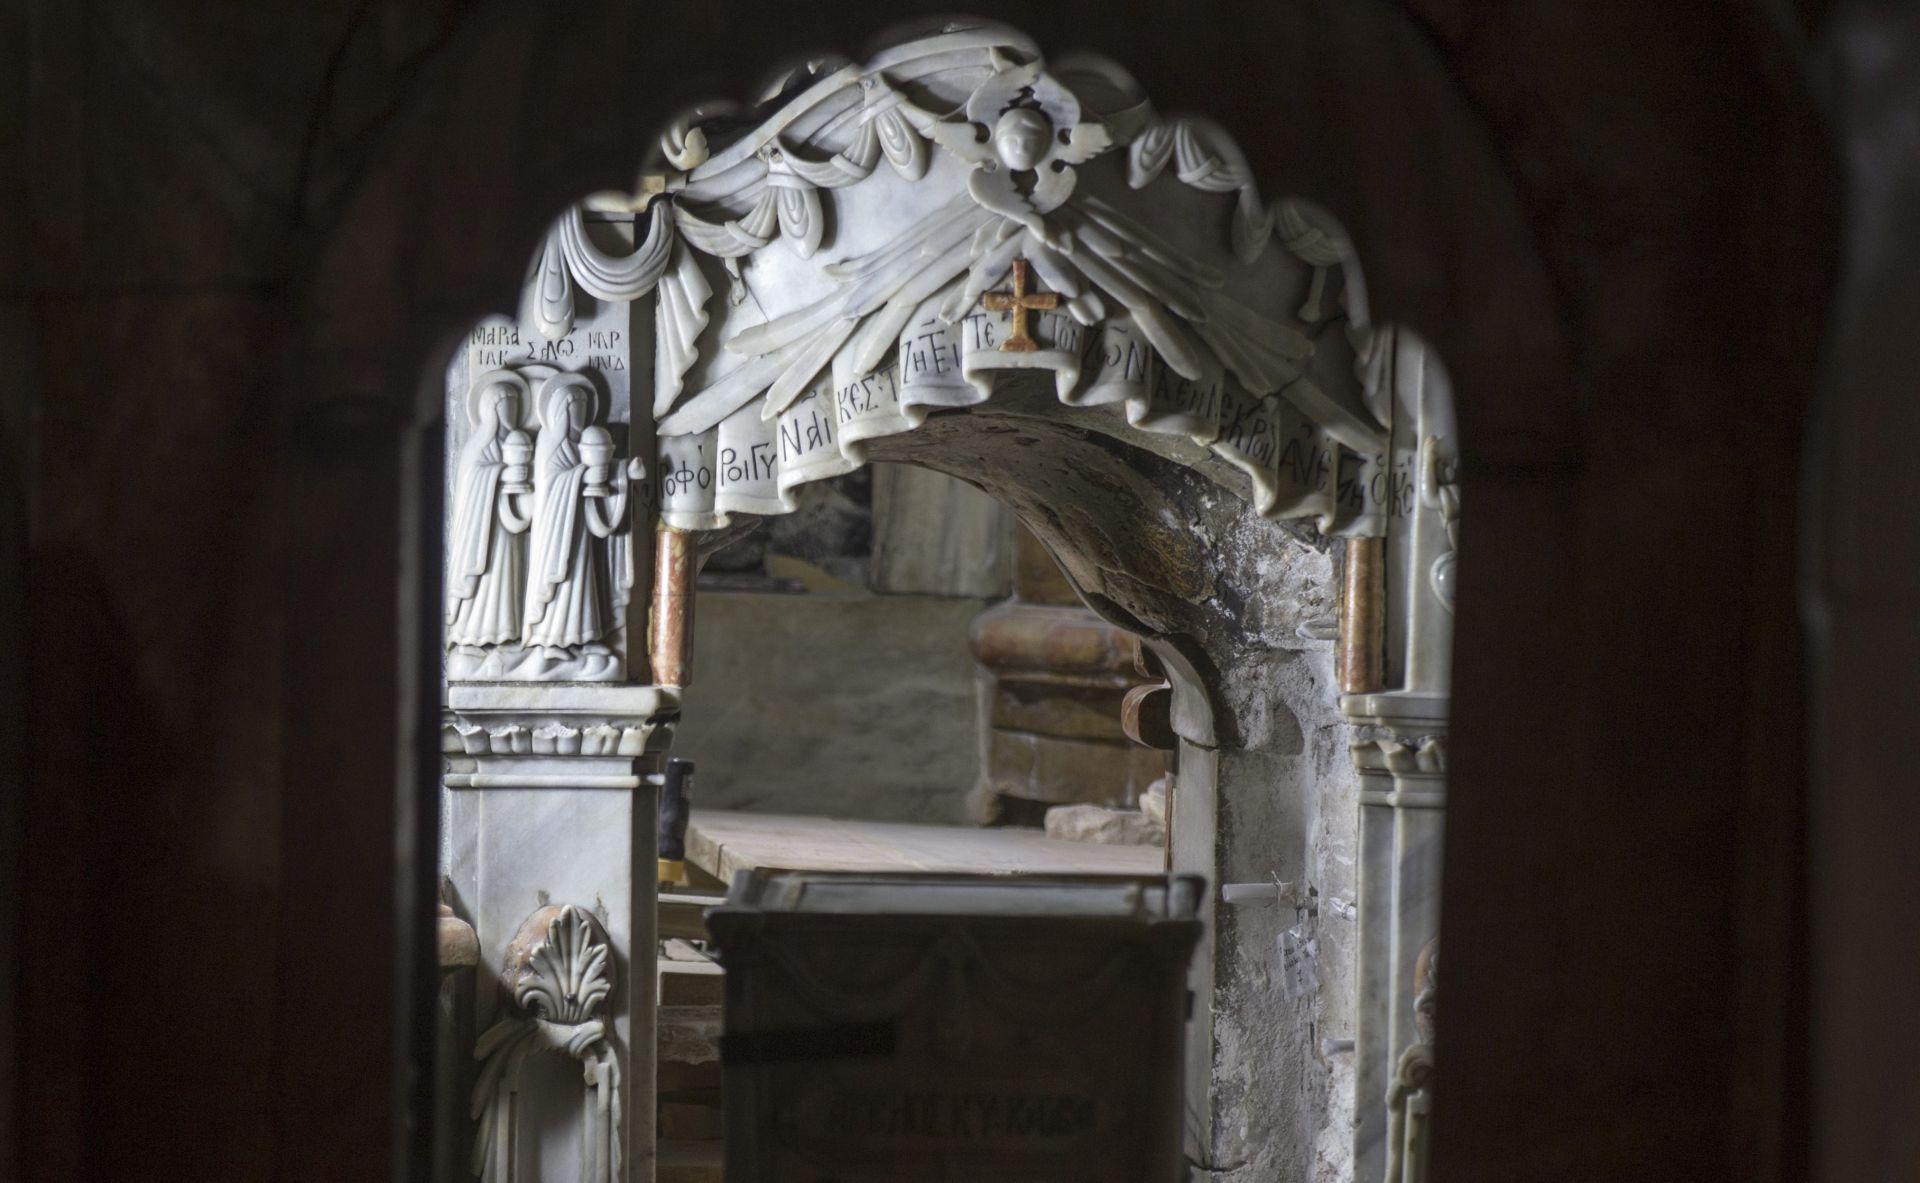 ZAPOČELA OBNOVA Nakon dva stoljeća otvoren Isusov grob